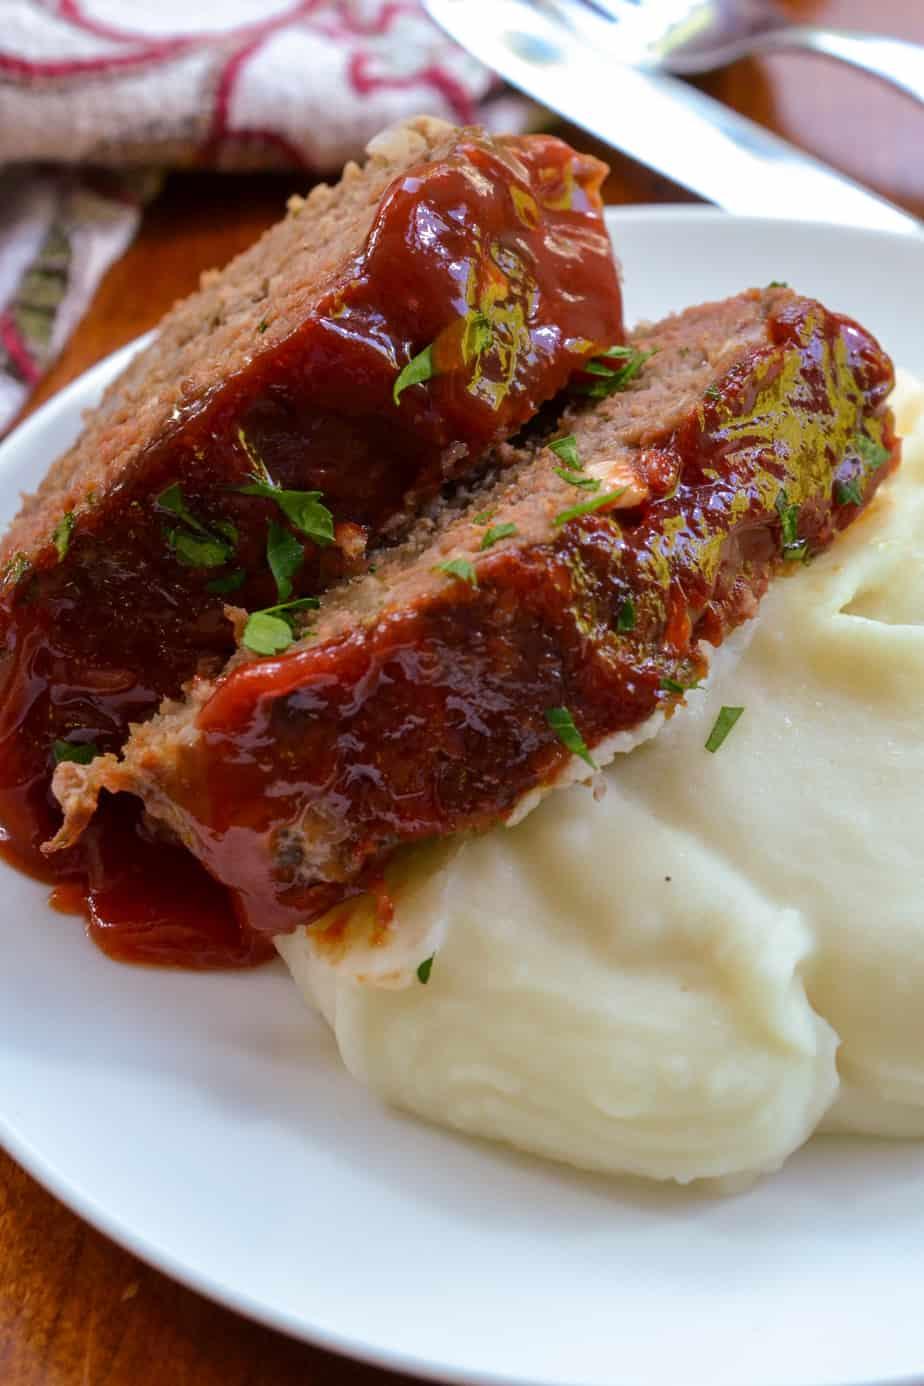 Sliced meatloaf on top of mashed potatoes.